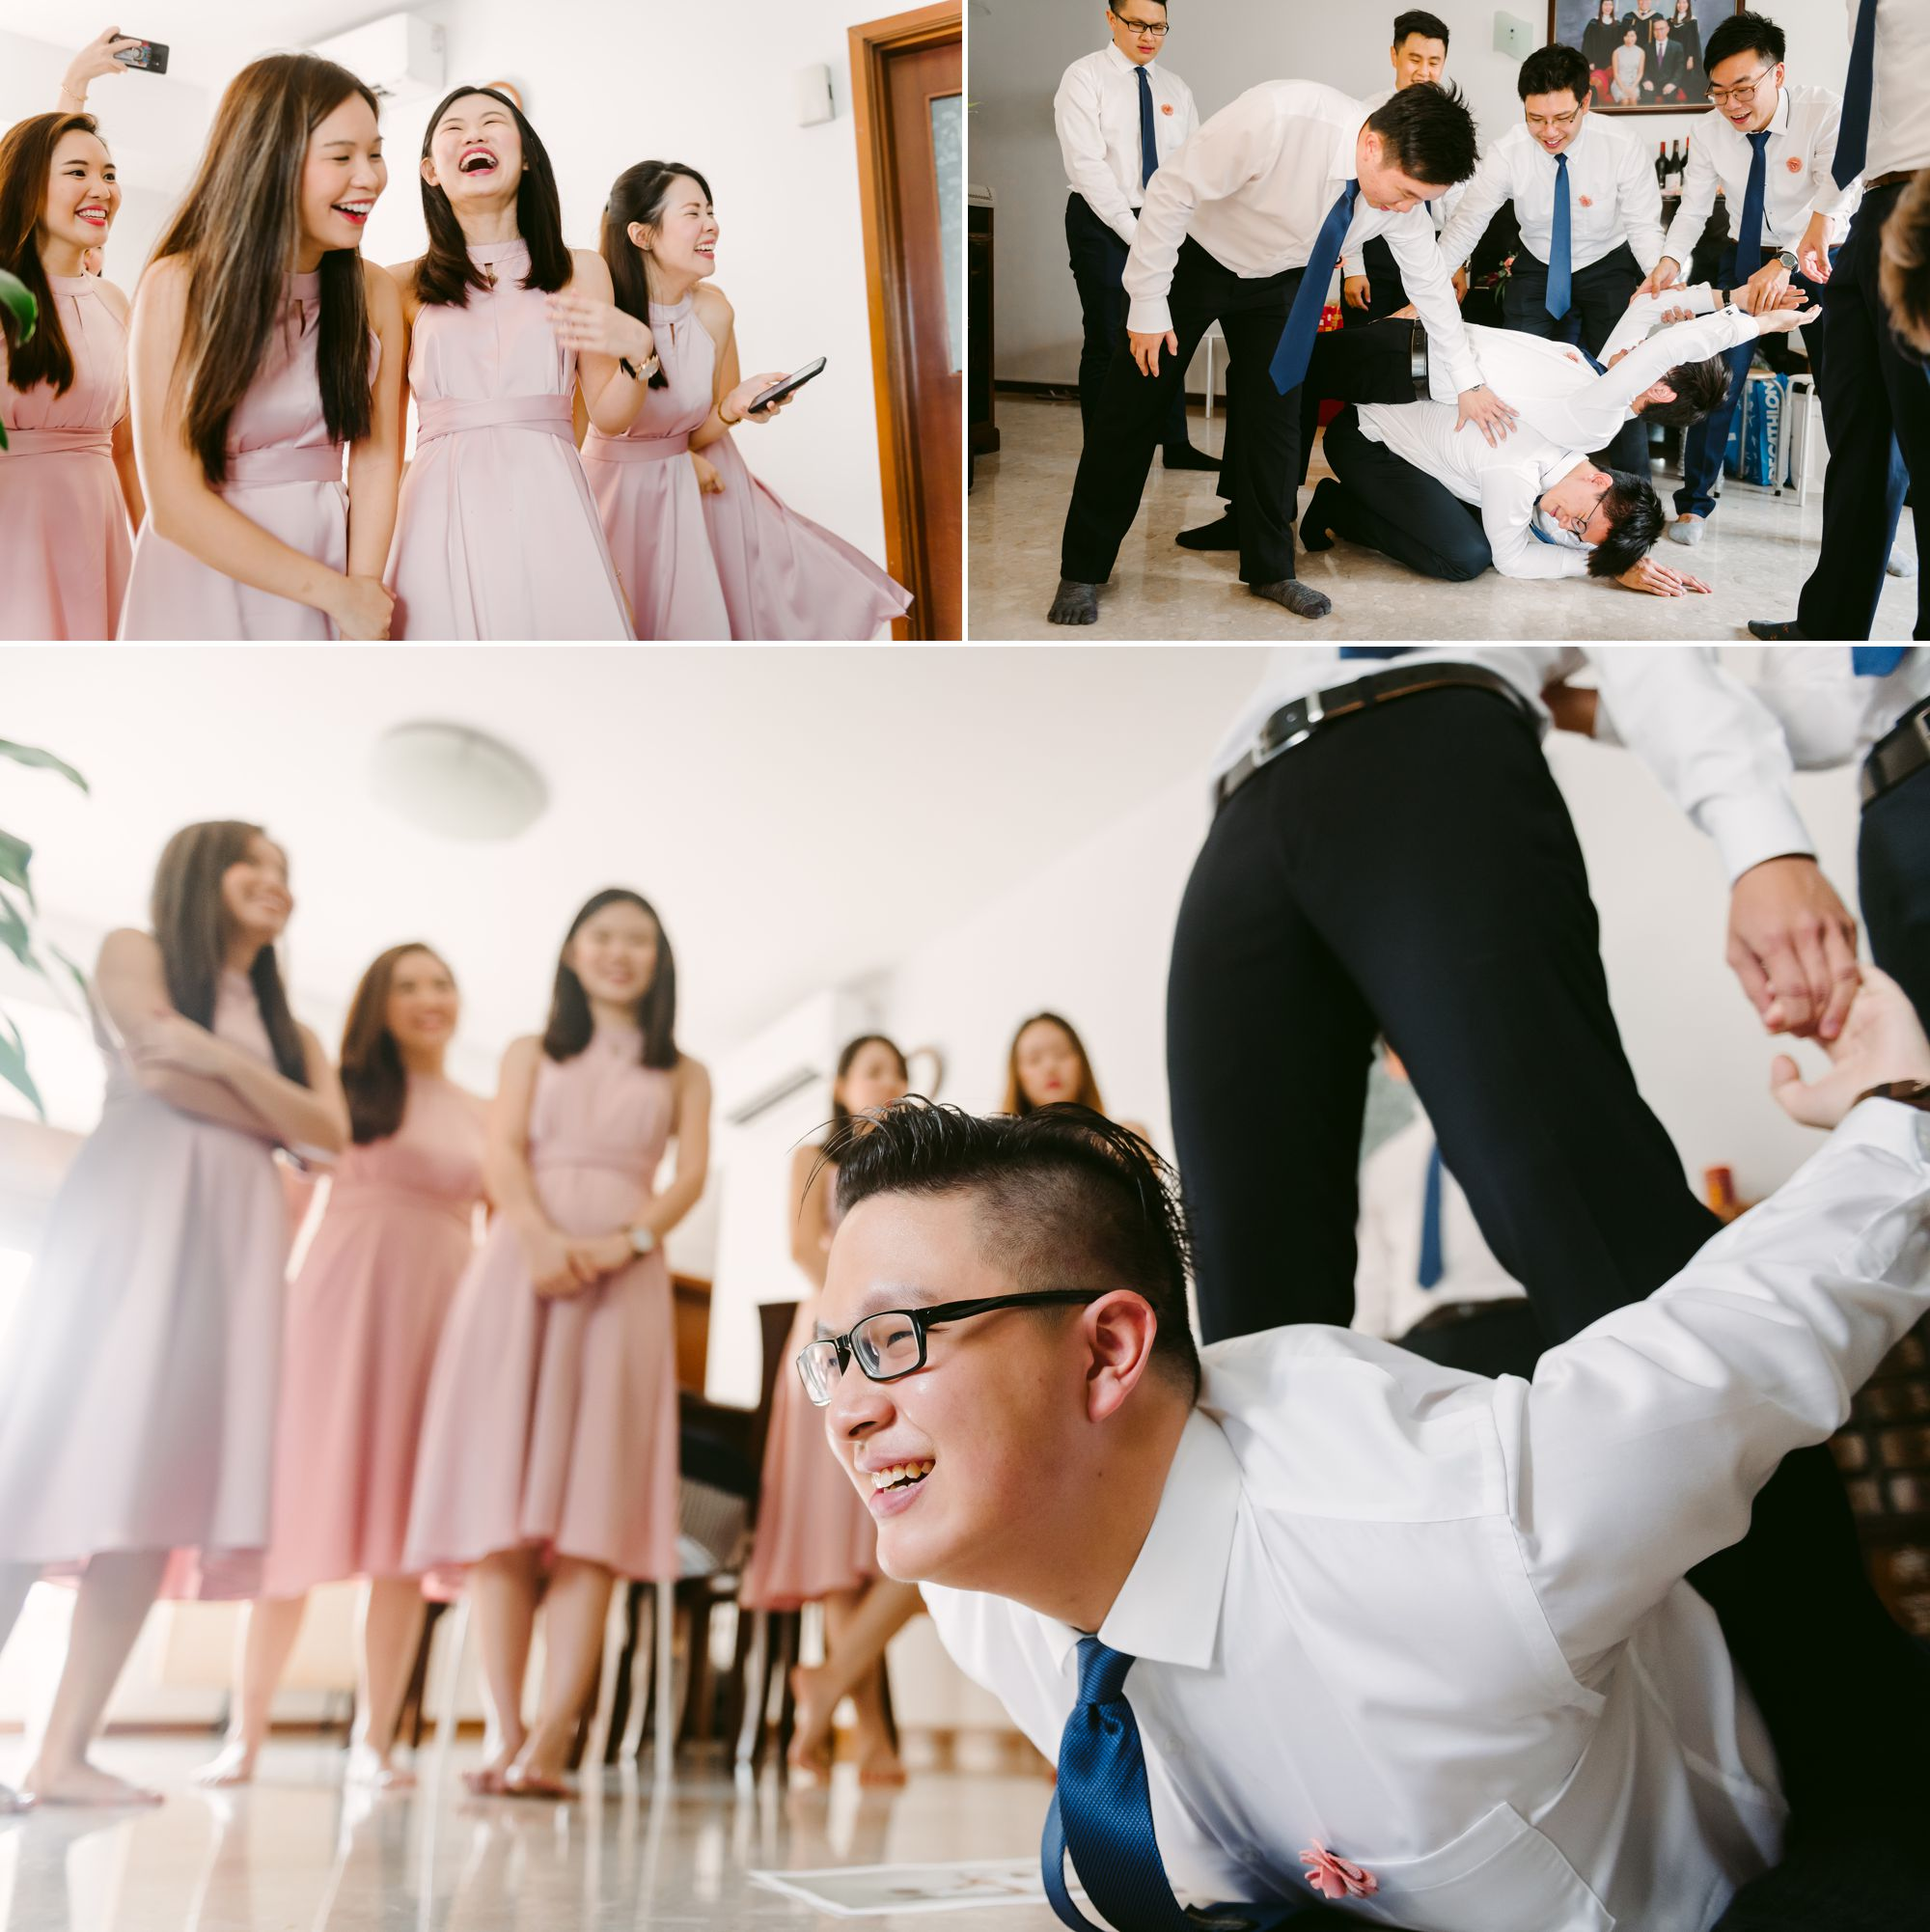 conrad_wedding_Singapore_ 14.jpg